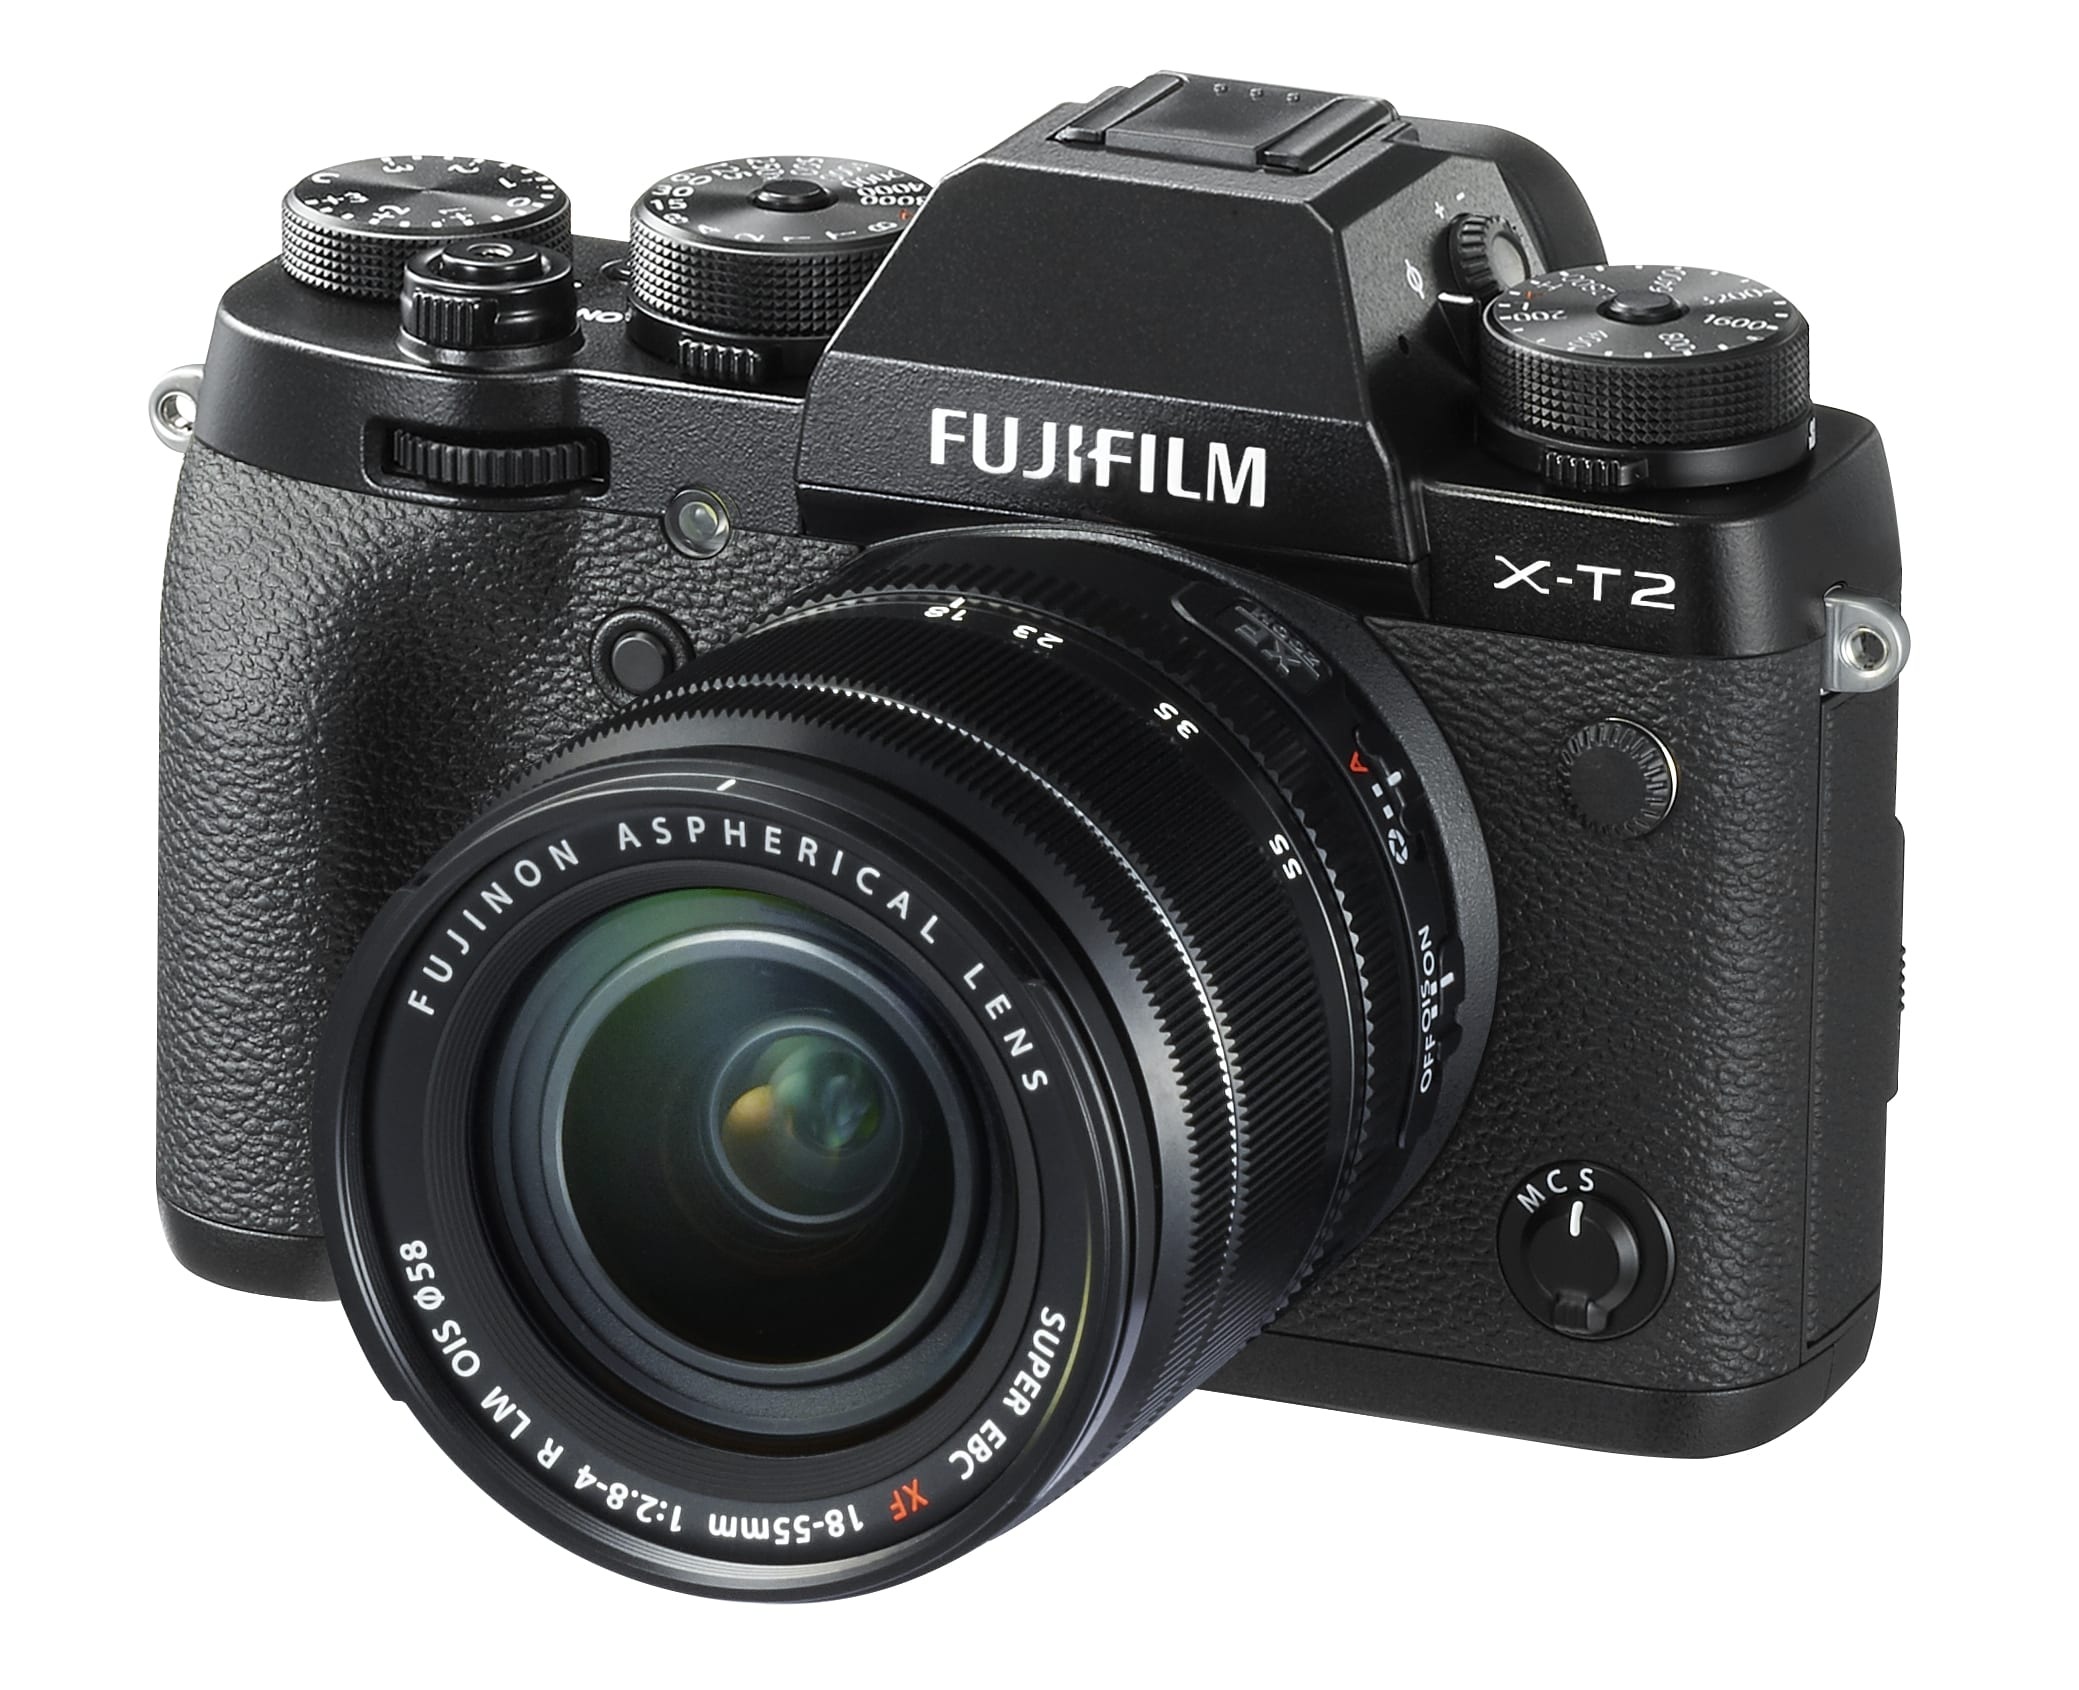 Fuji unveils new flagship mirrorless camera – British